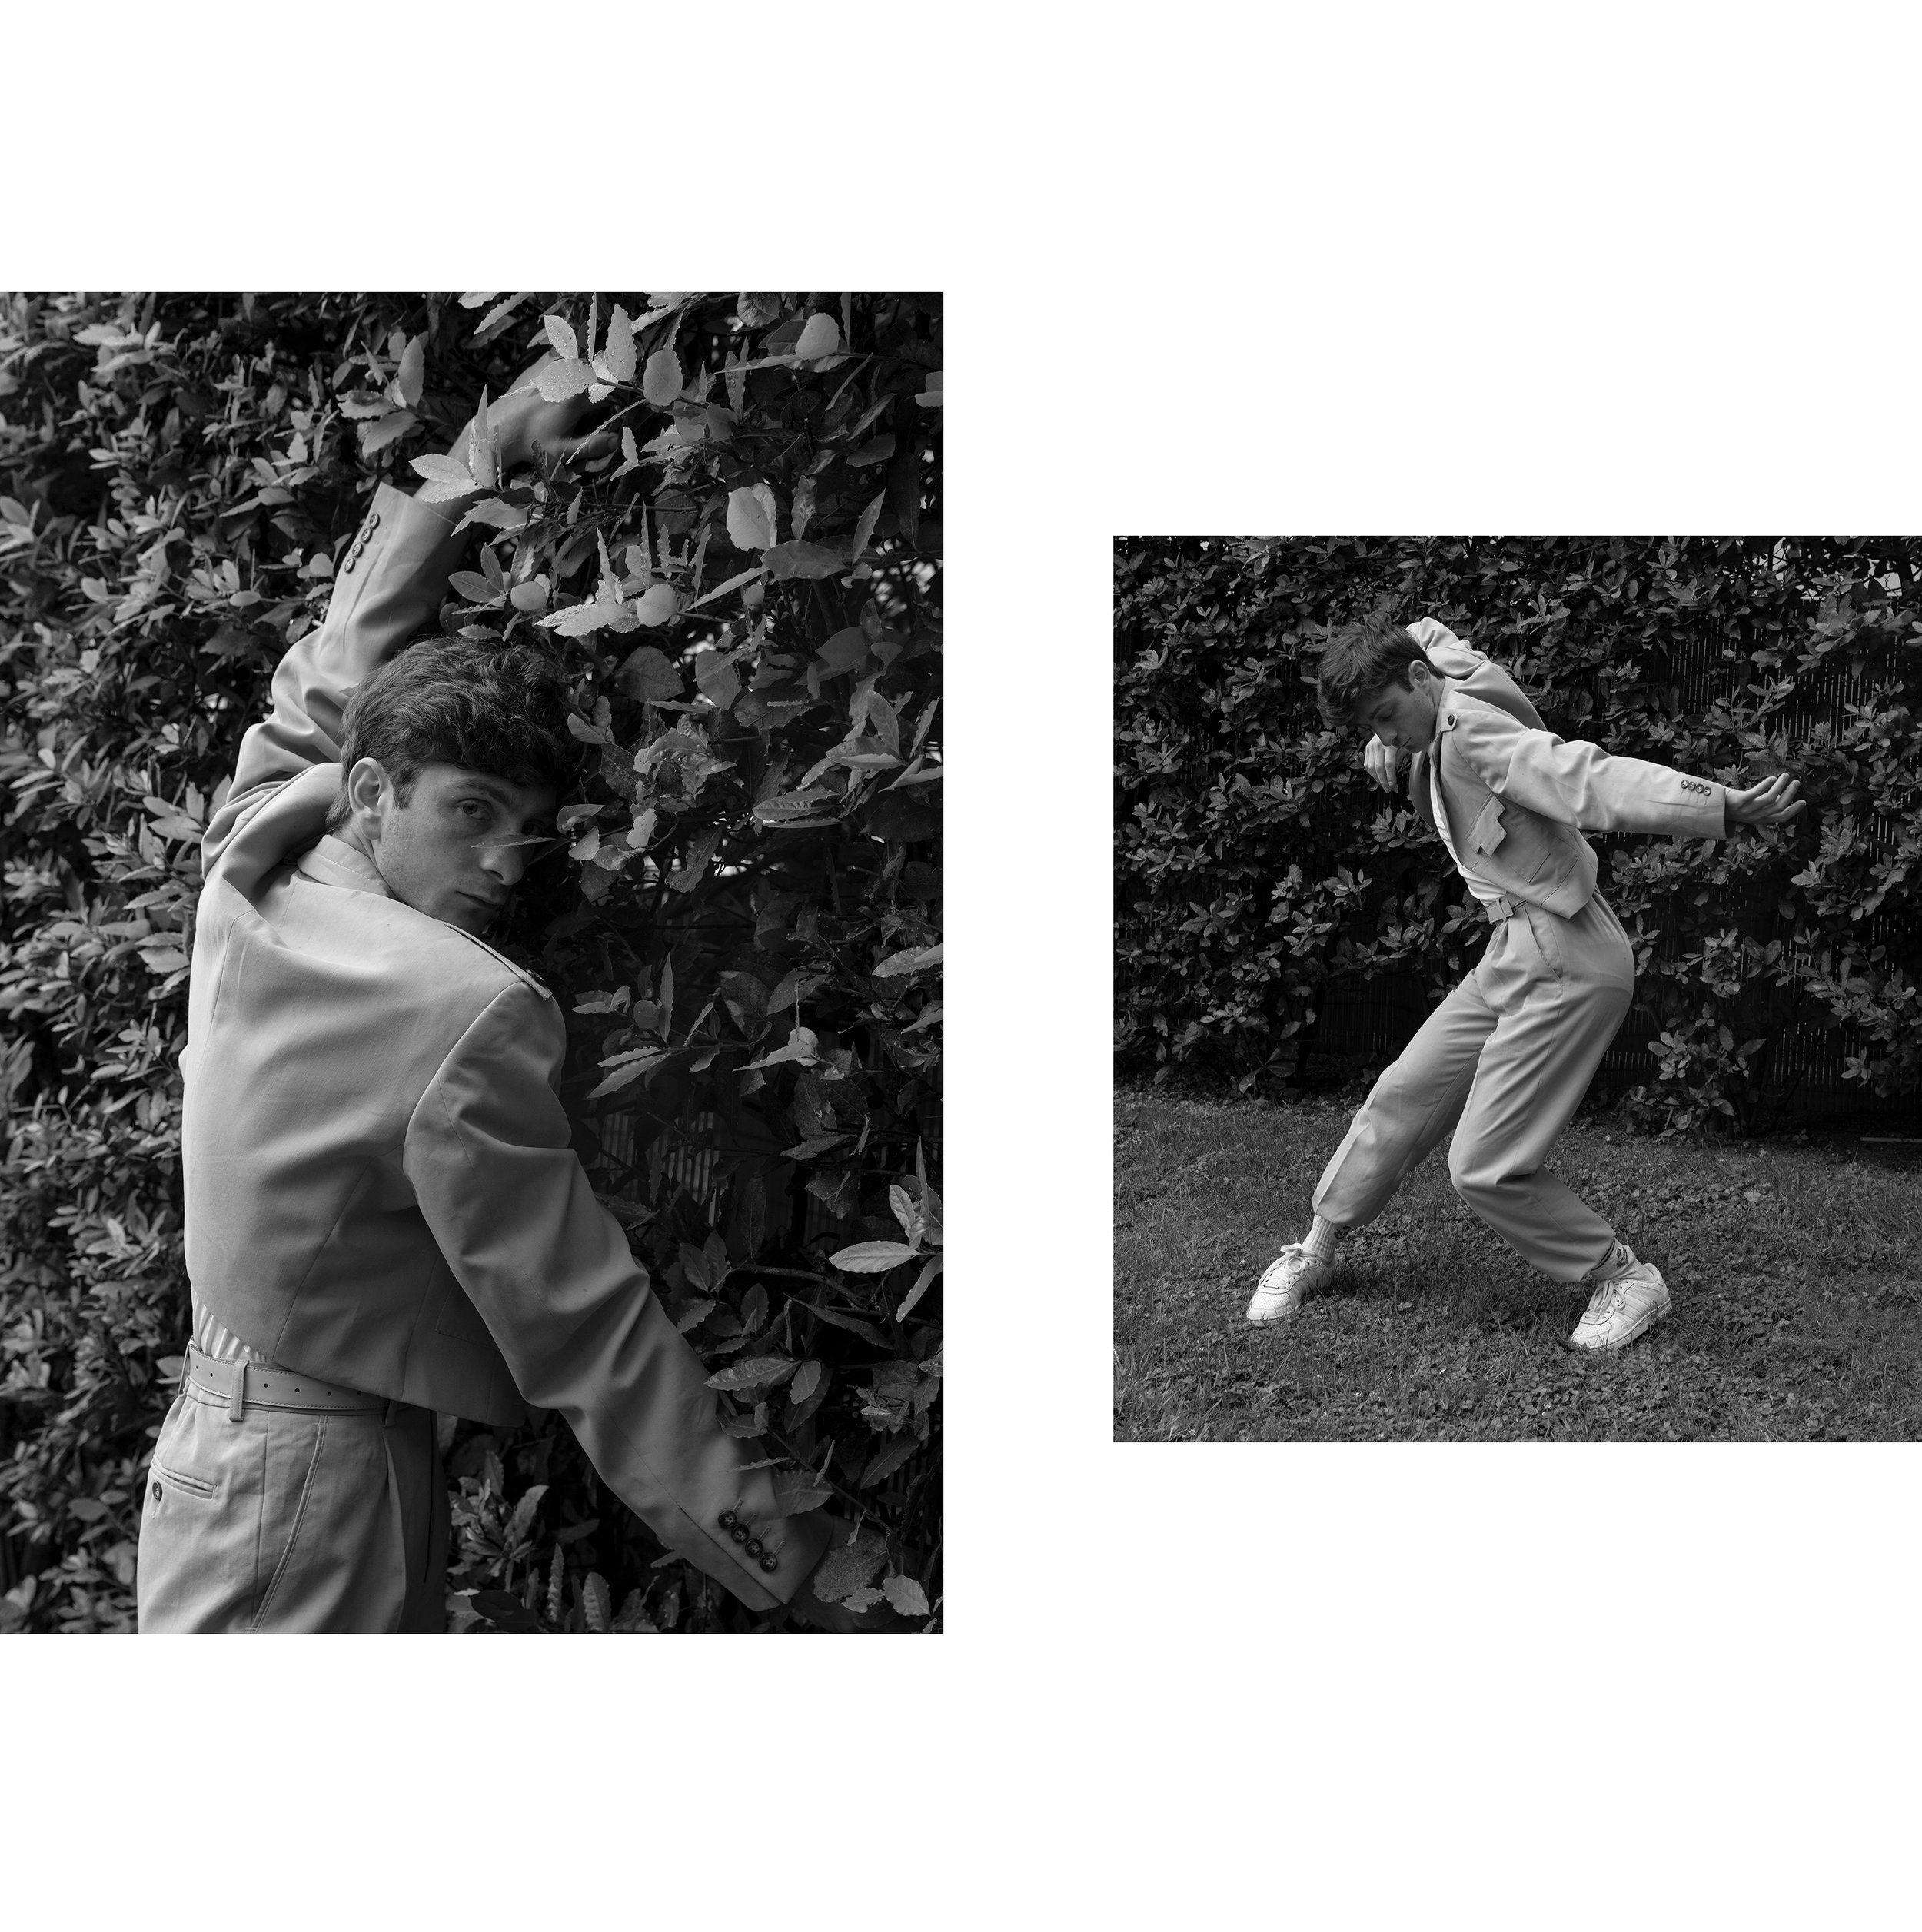 Levan Gelbakhiani / W Magazine